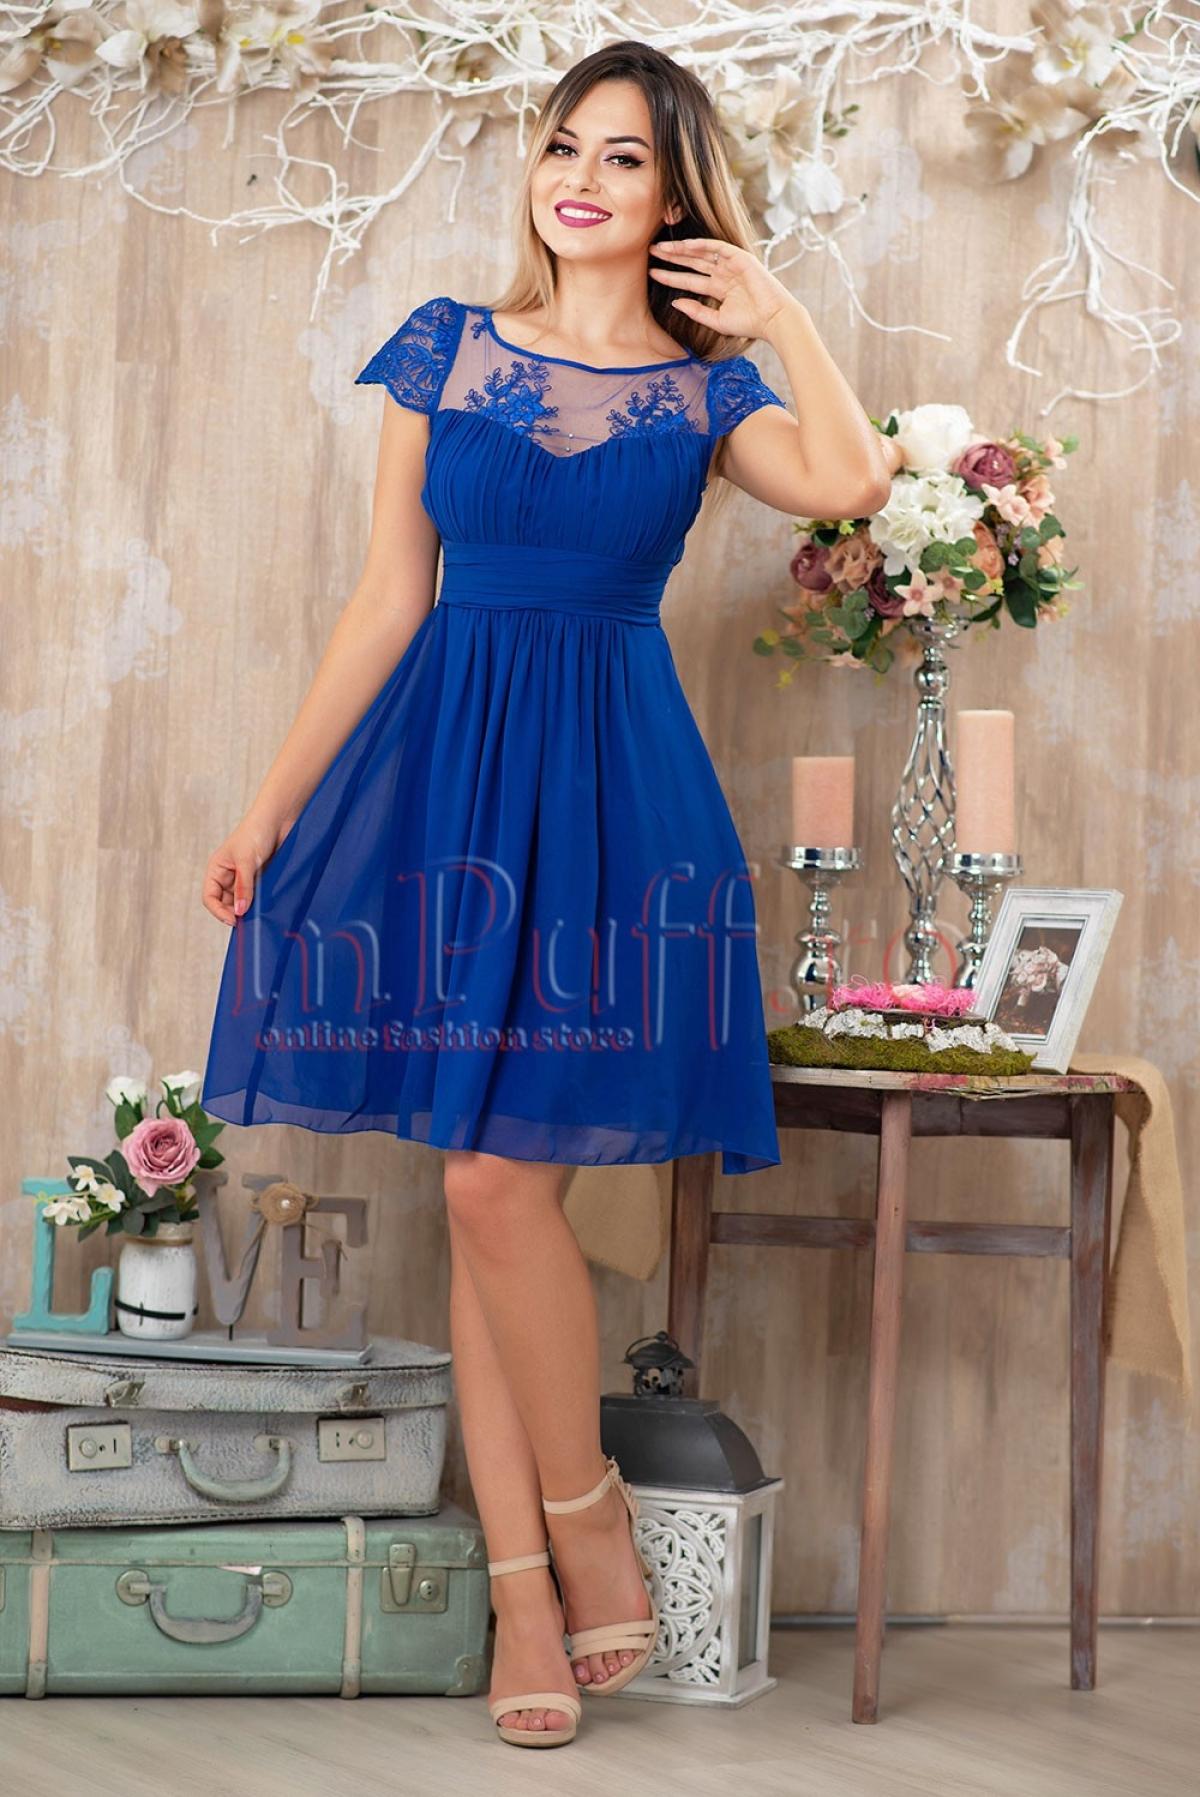 Rochie de ocazie albastru electric din voal si broderie